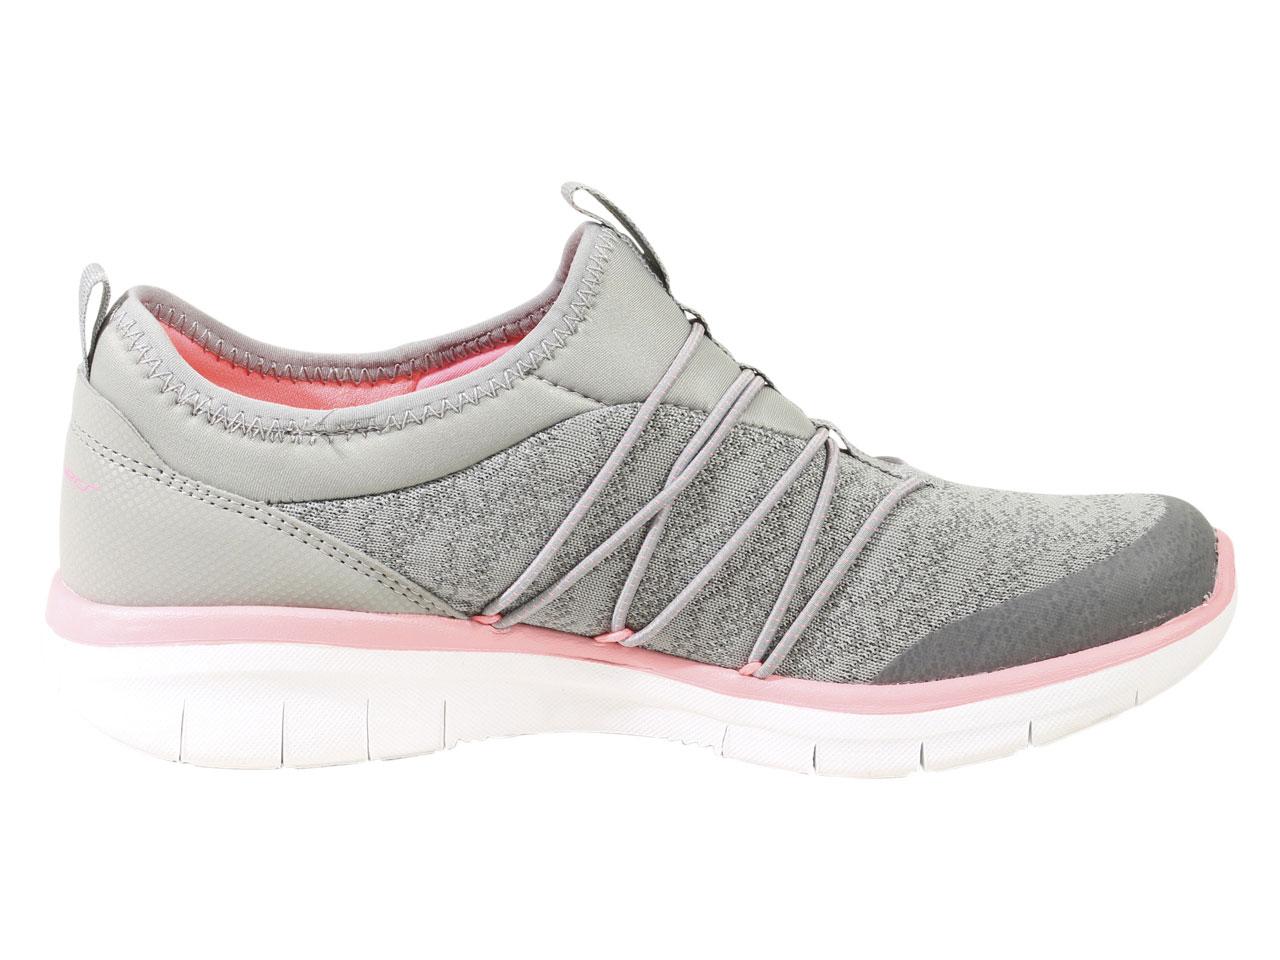 Skechers Foam Synergy-2.0 Simply Chic Memory Foam Skechers Sneakers Schuhes efda5a